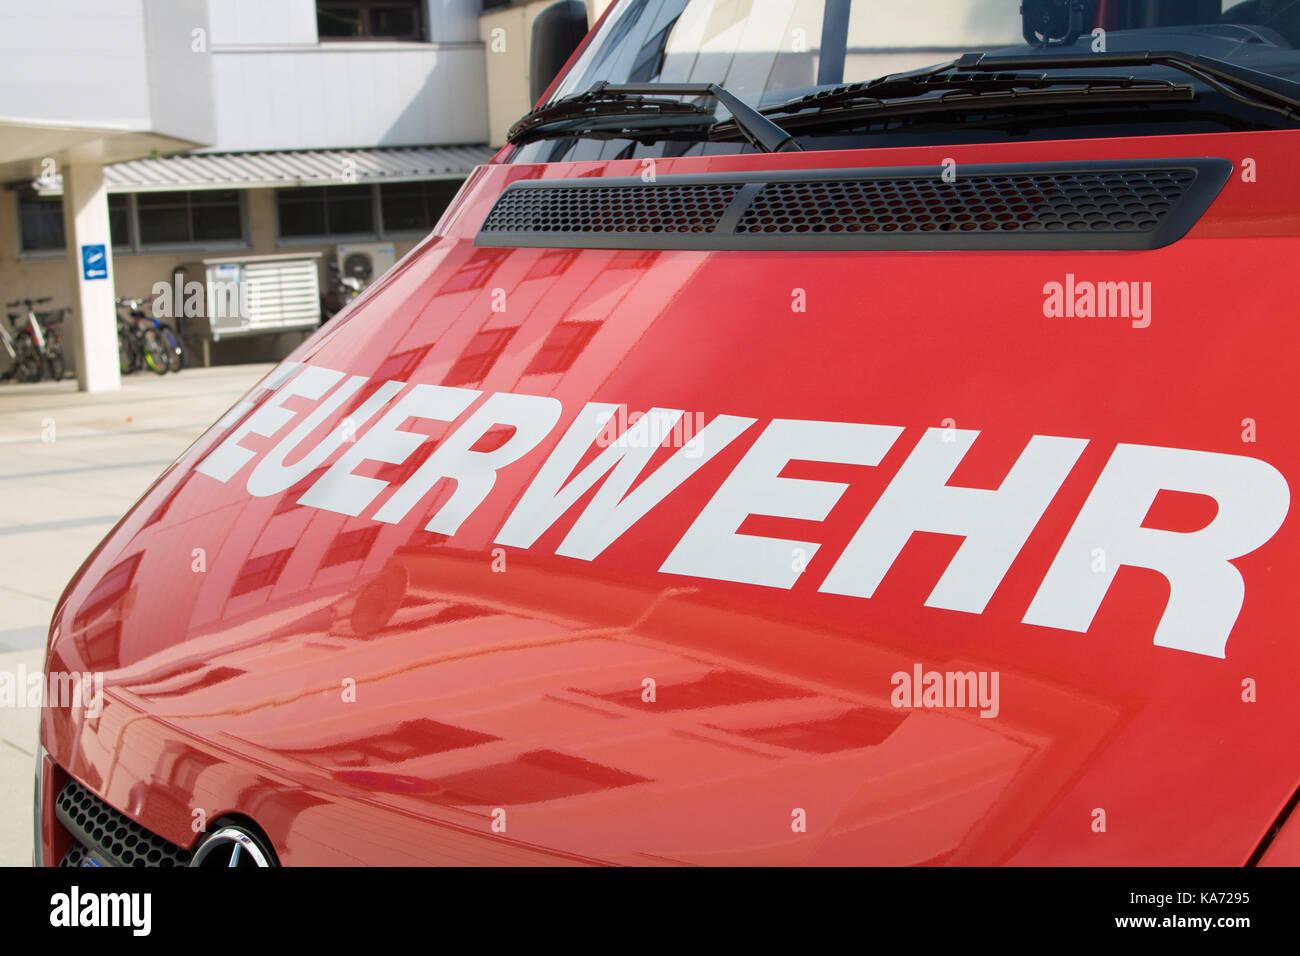 Fire truck, austria, cal 122 - Stock Image